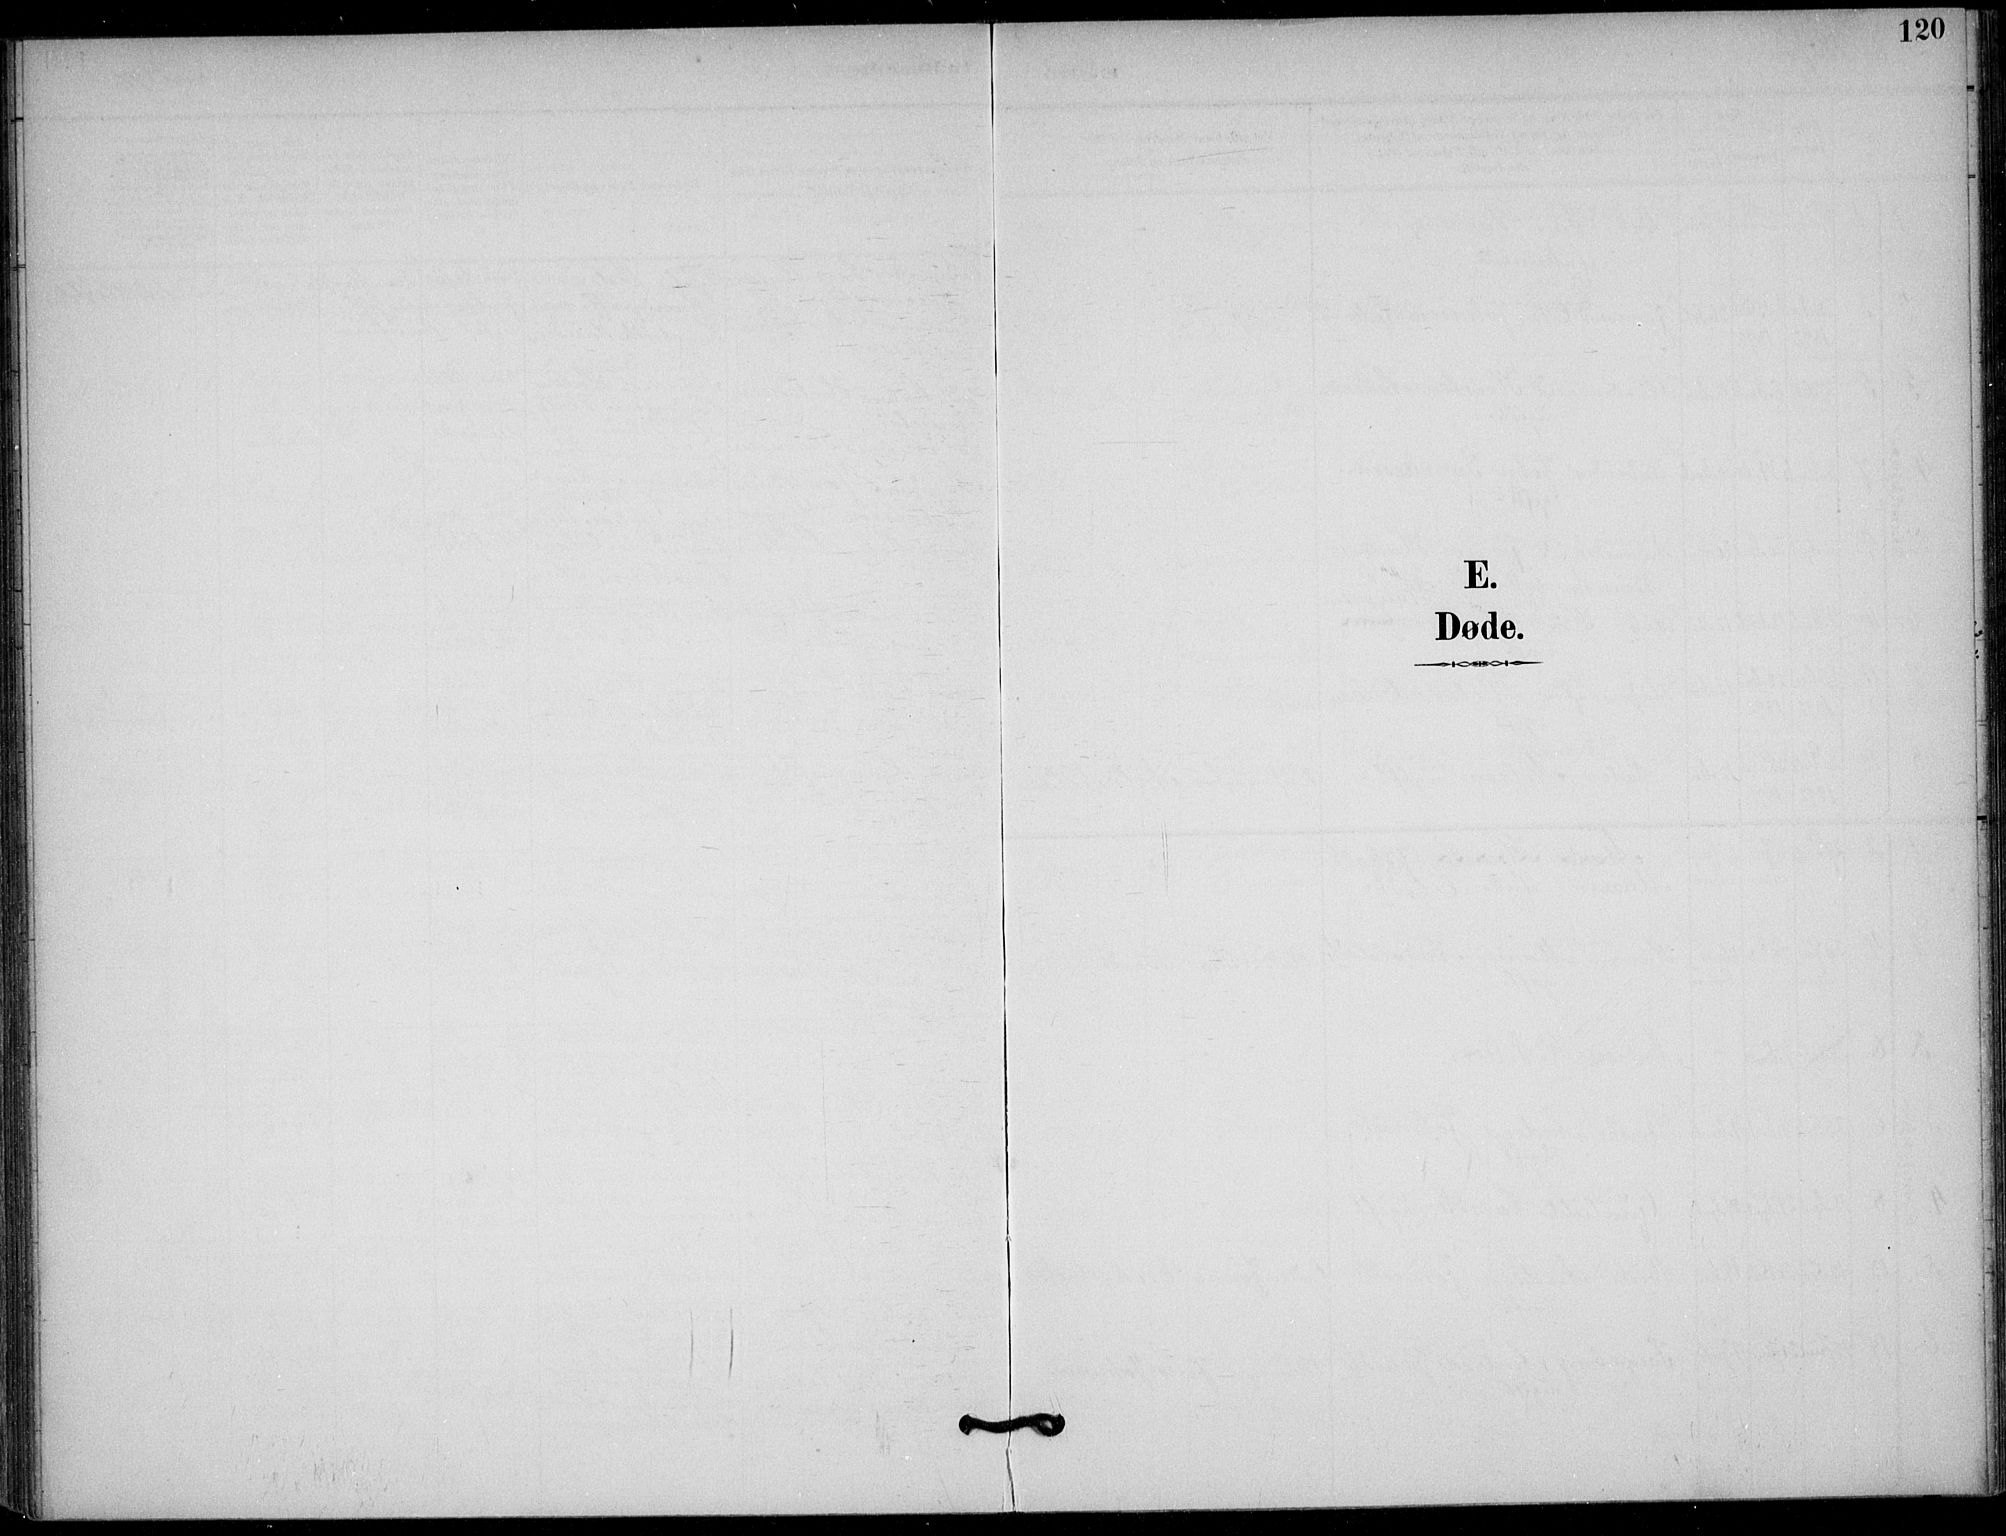 SAKO, Solum kirkebøker, F/Fb/L0002: Ministerialbok nr. II 2, 1893-1901, s. 120